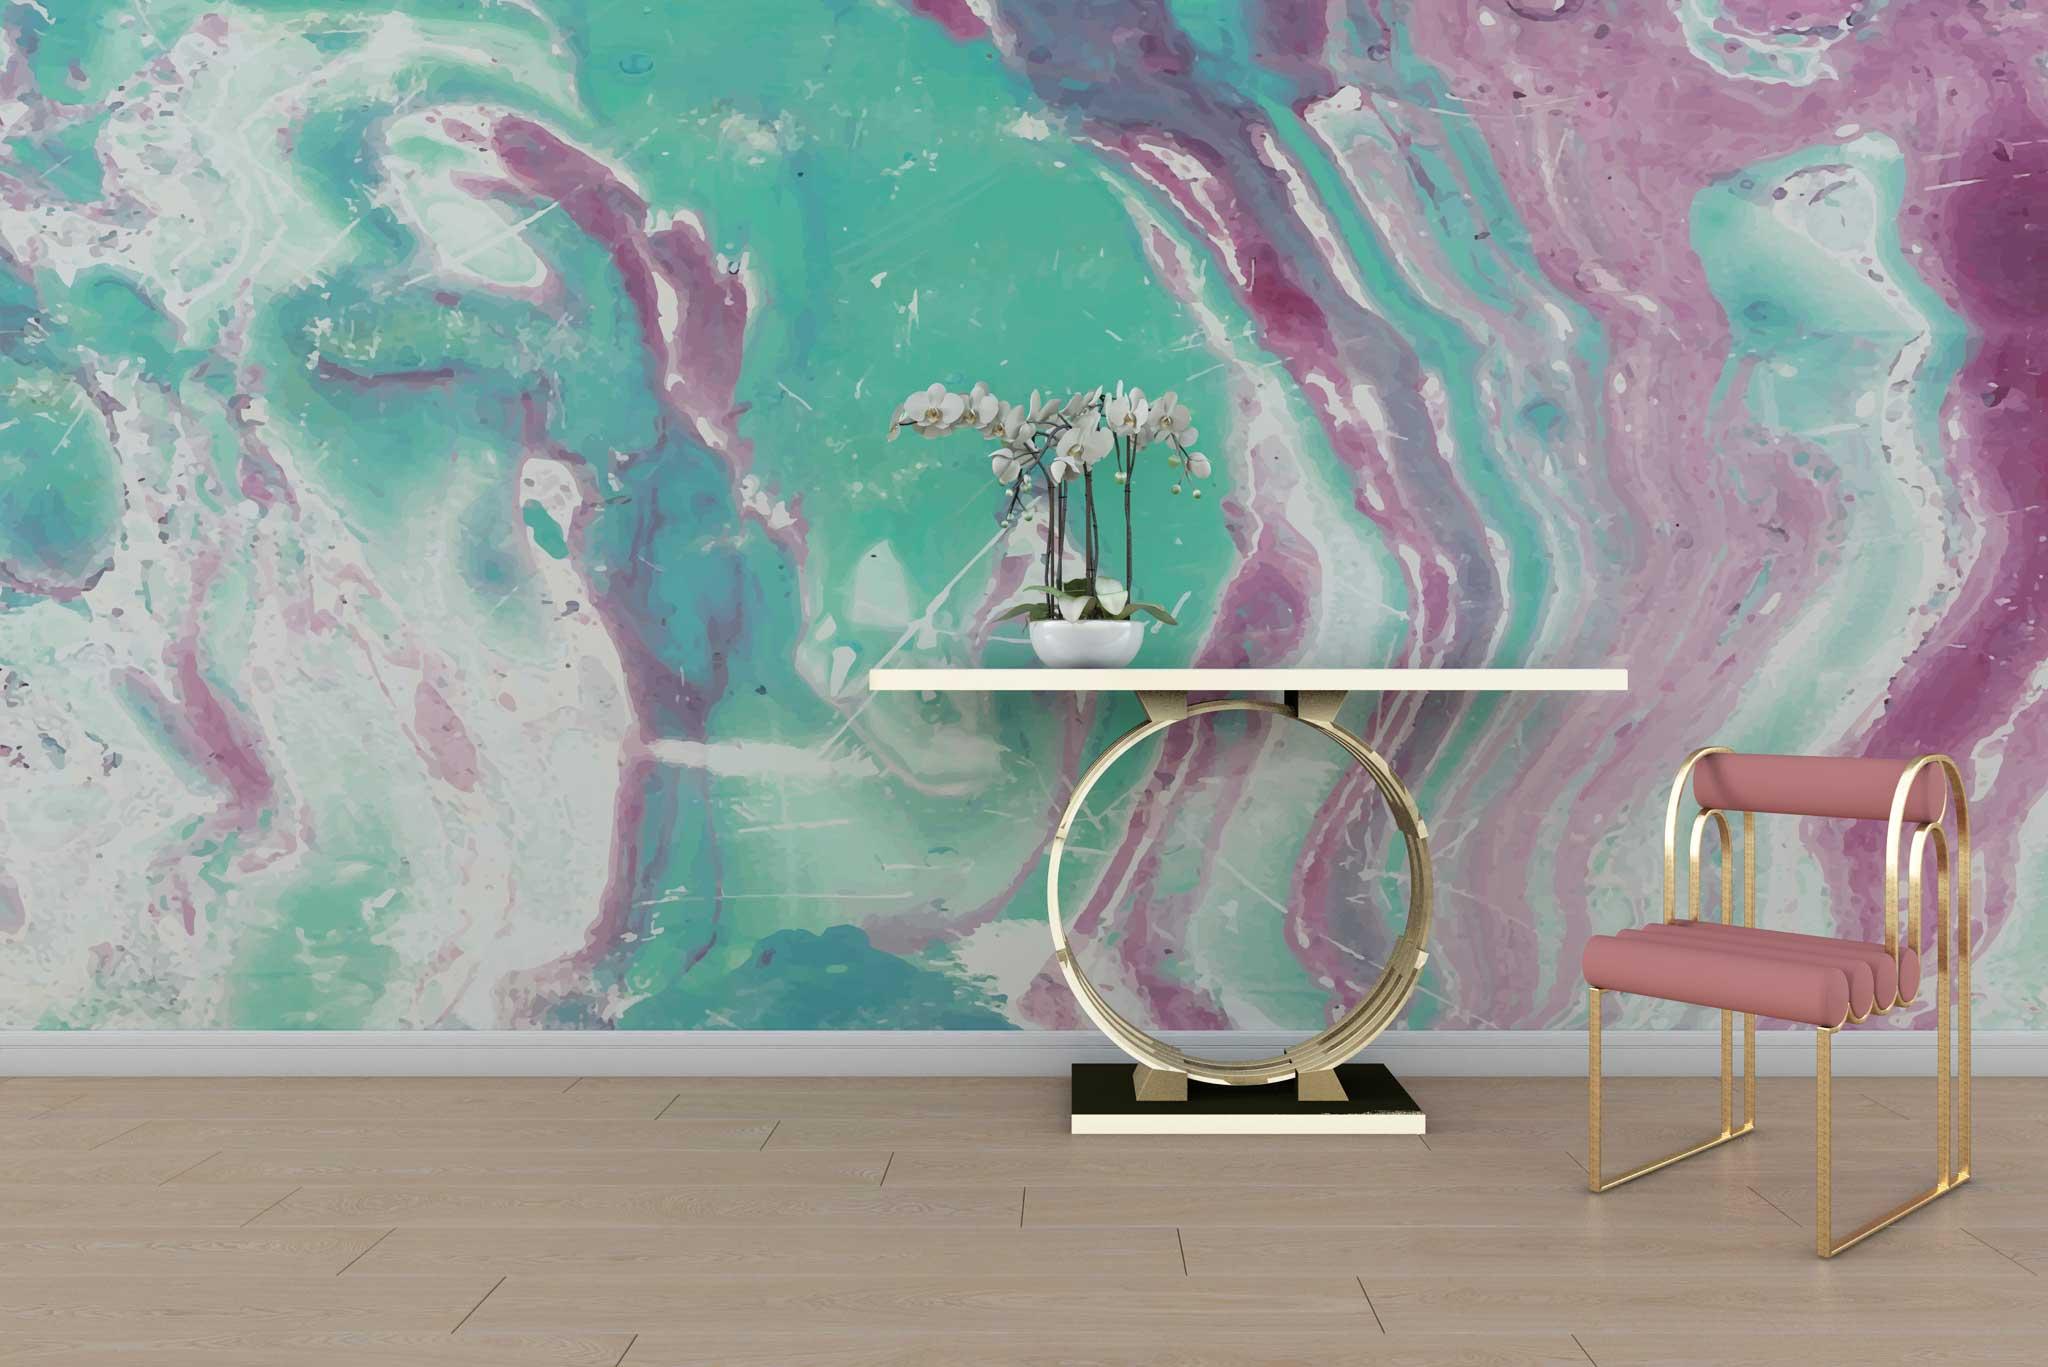 tapet-fototapet-special-personalizat-customizabil-comanda-bucuresti-daring-prints-abstract-mineral-culori-mov-lila-verde-mint